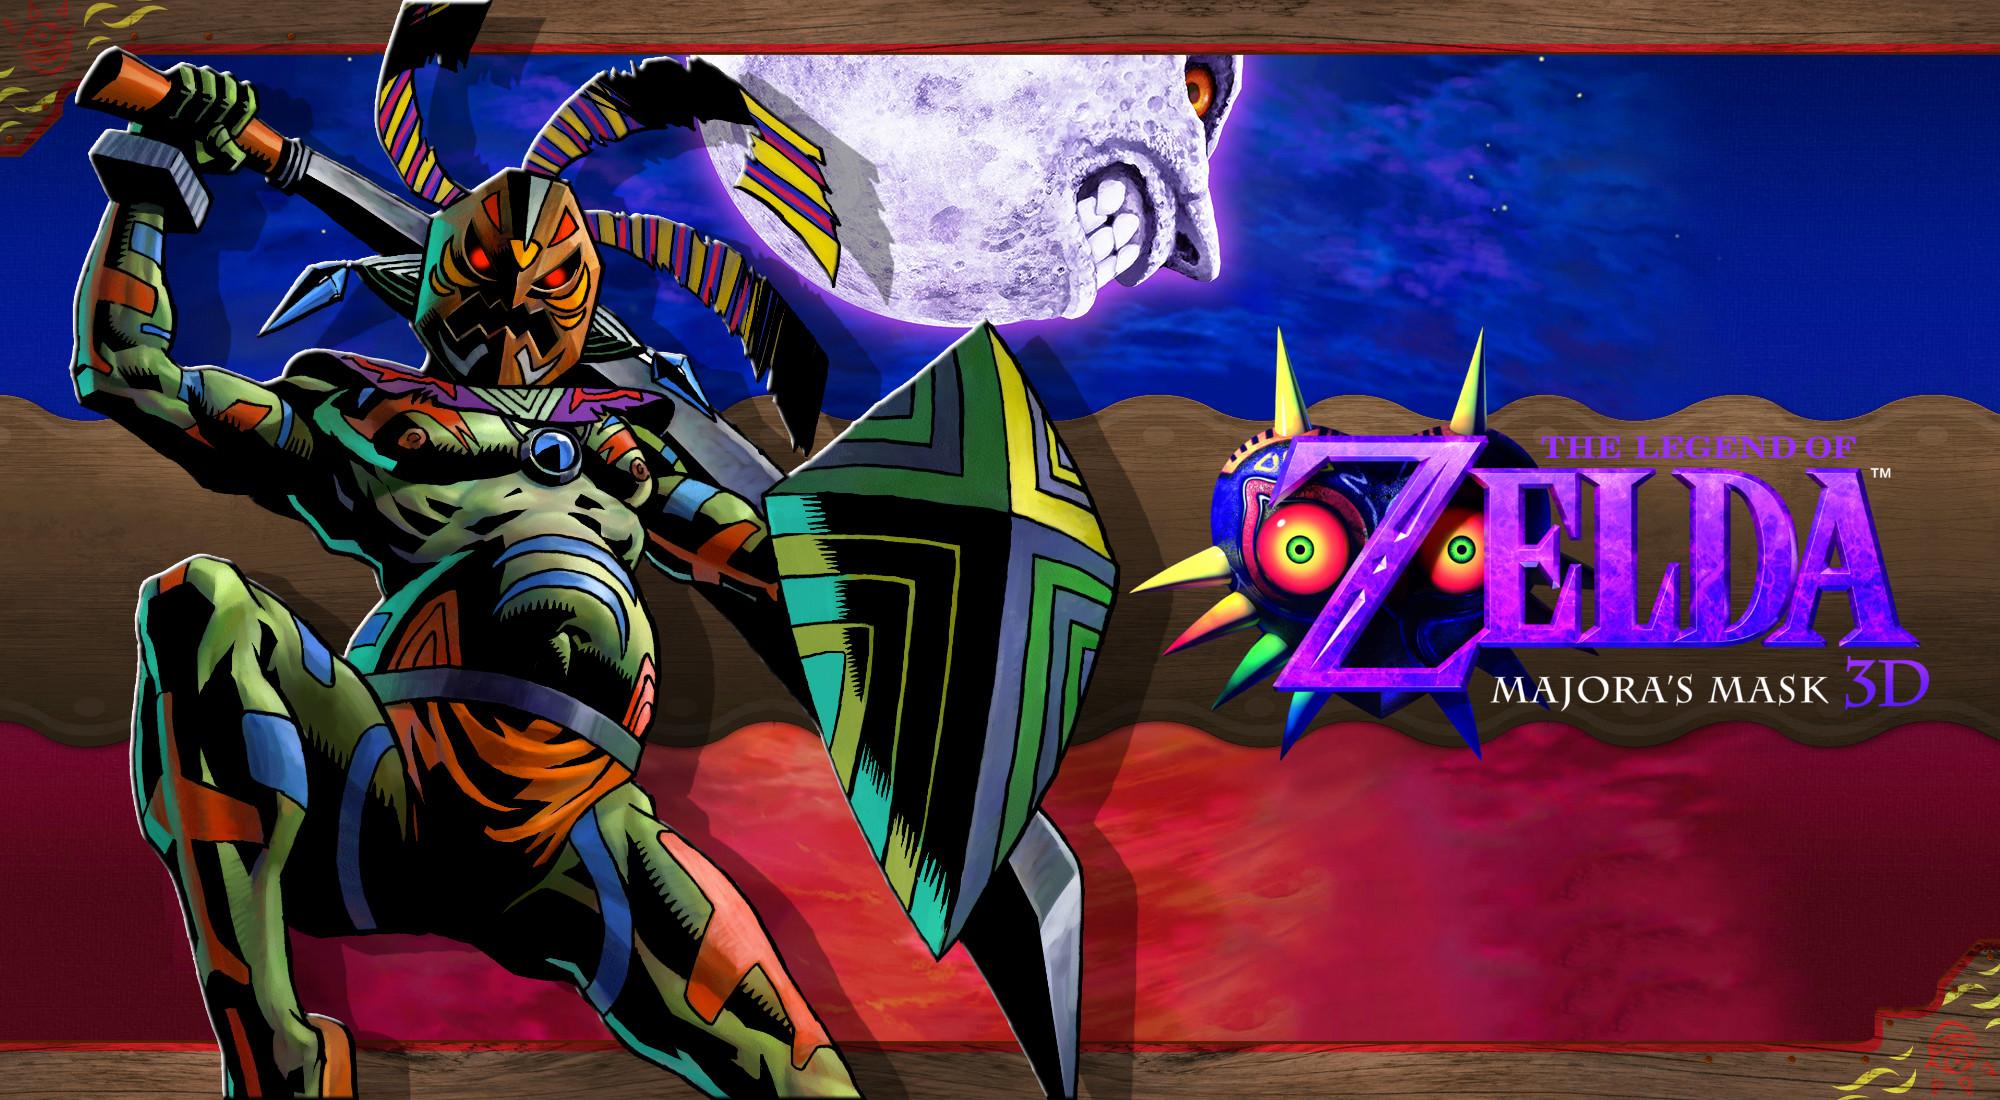 … Majora's Mask 3D Wallpaper – Odolwa by DaKidGaming